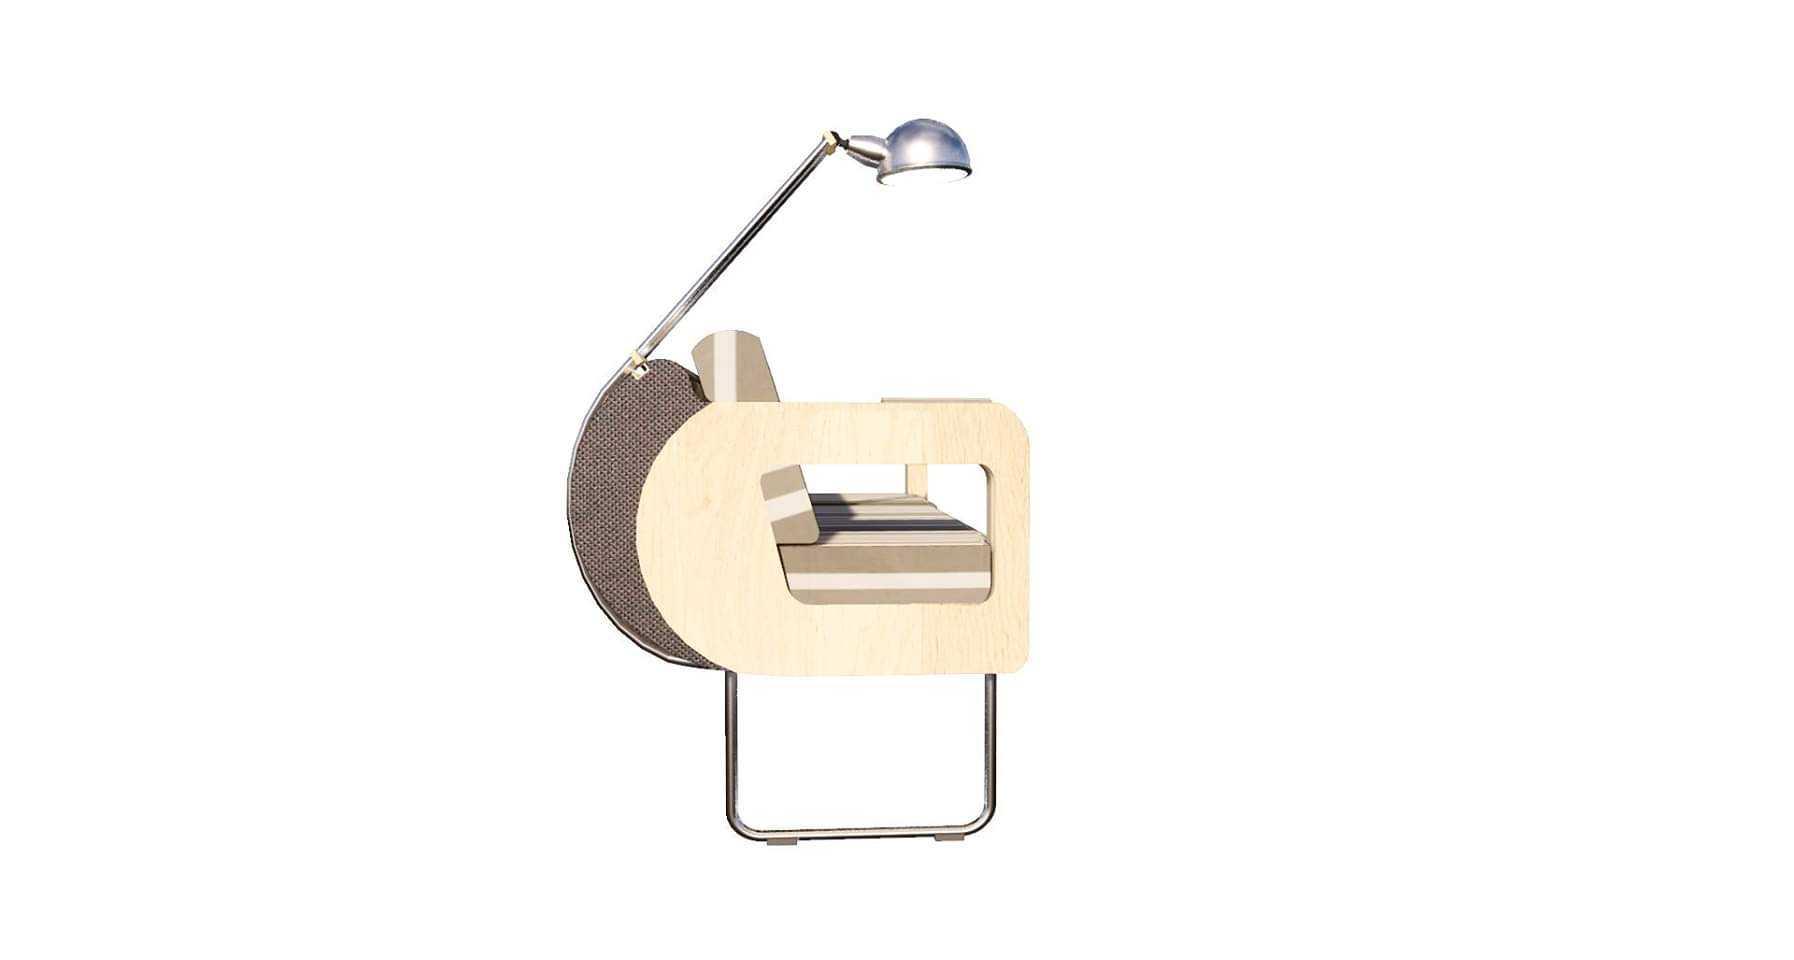 illuminés canapés 2.0 frederic tabary designer produit